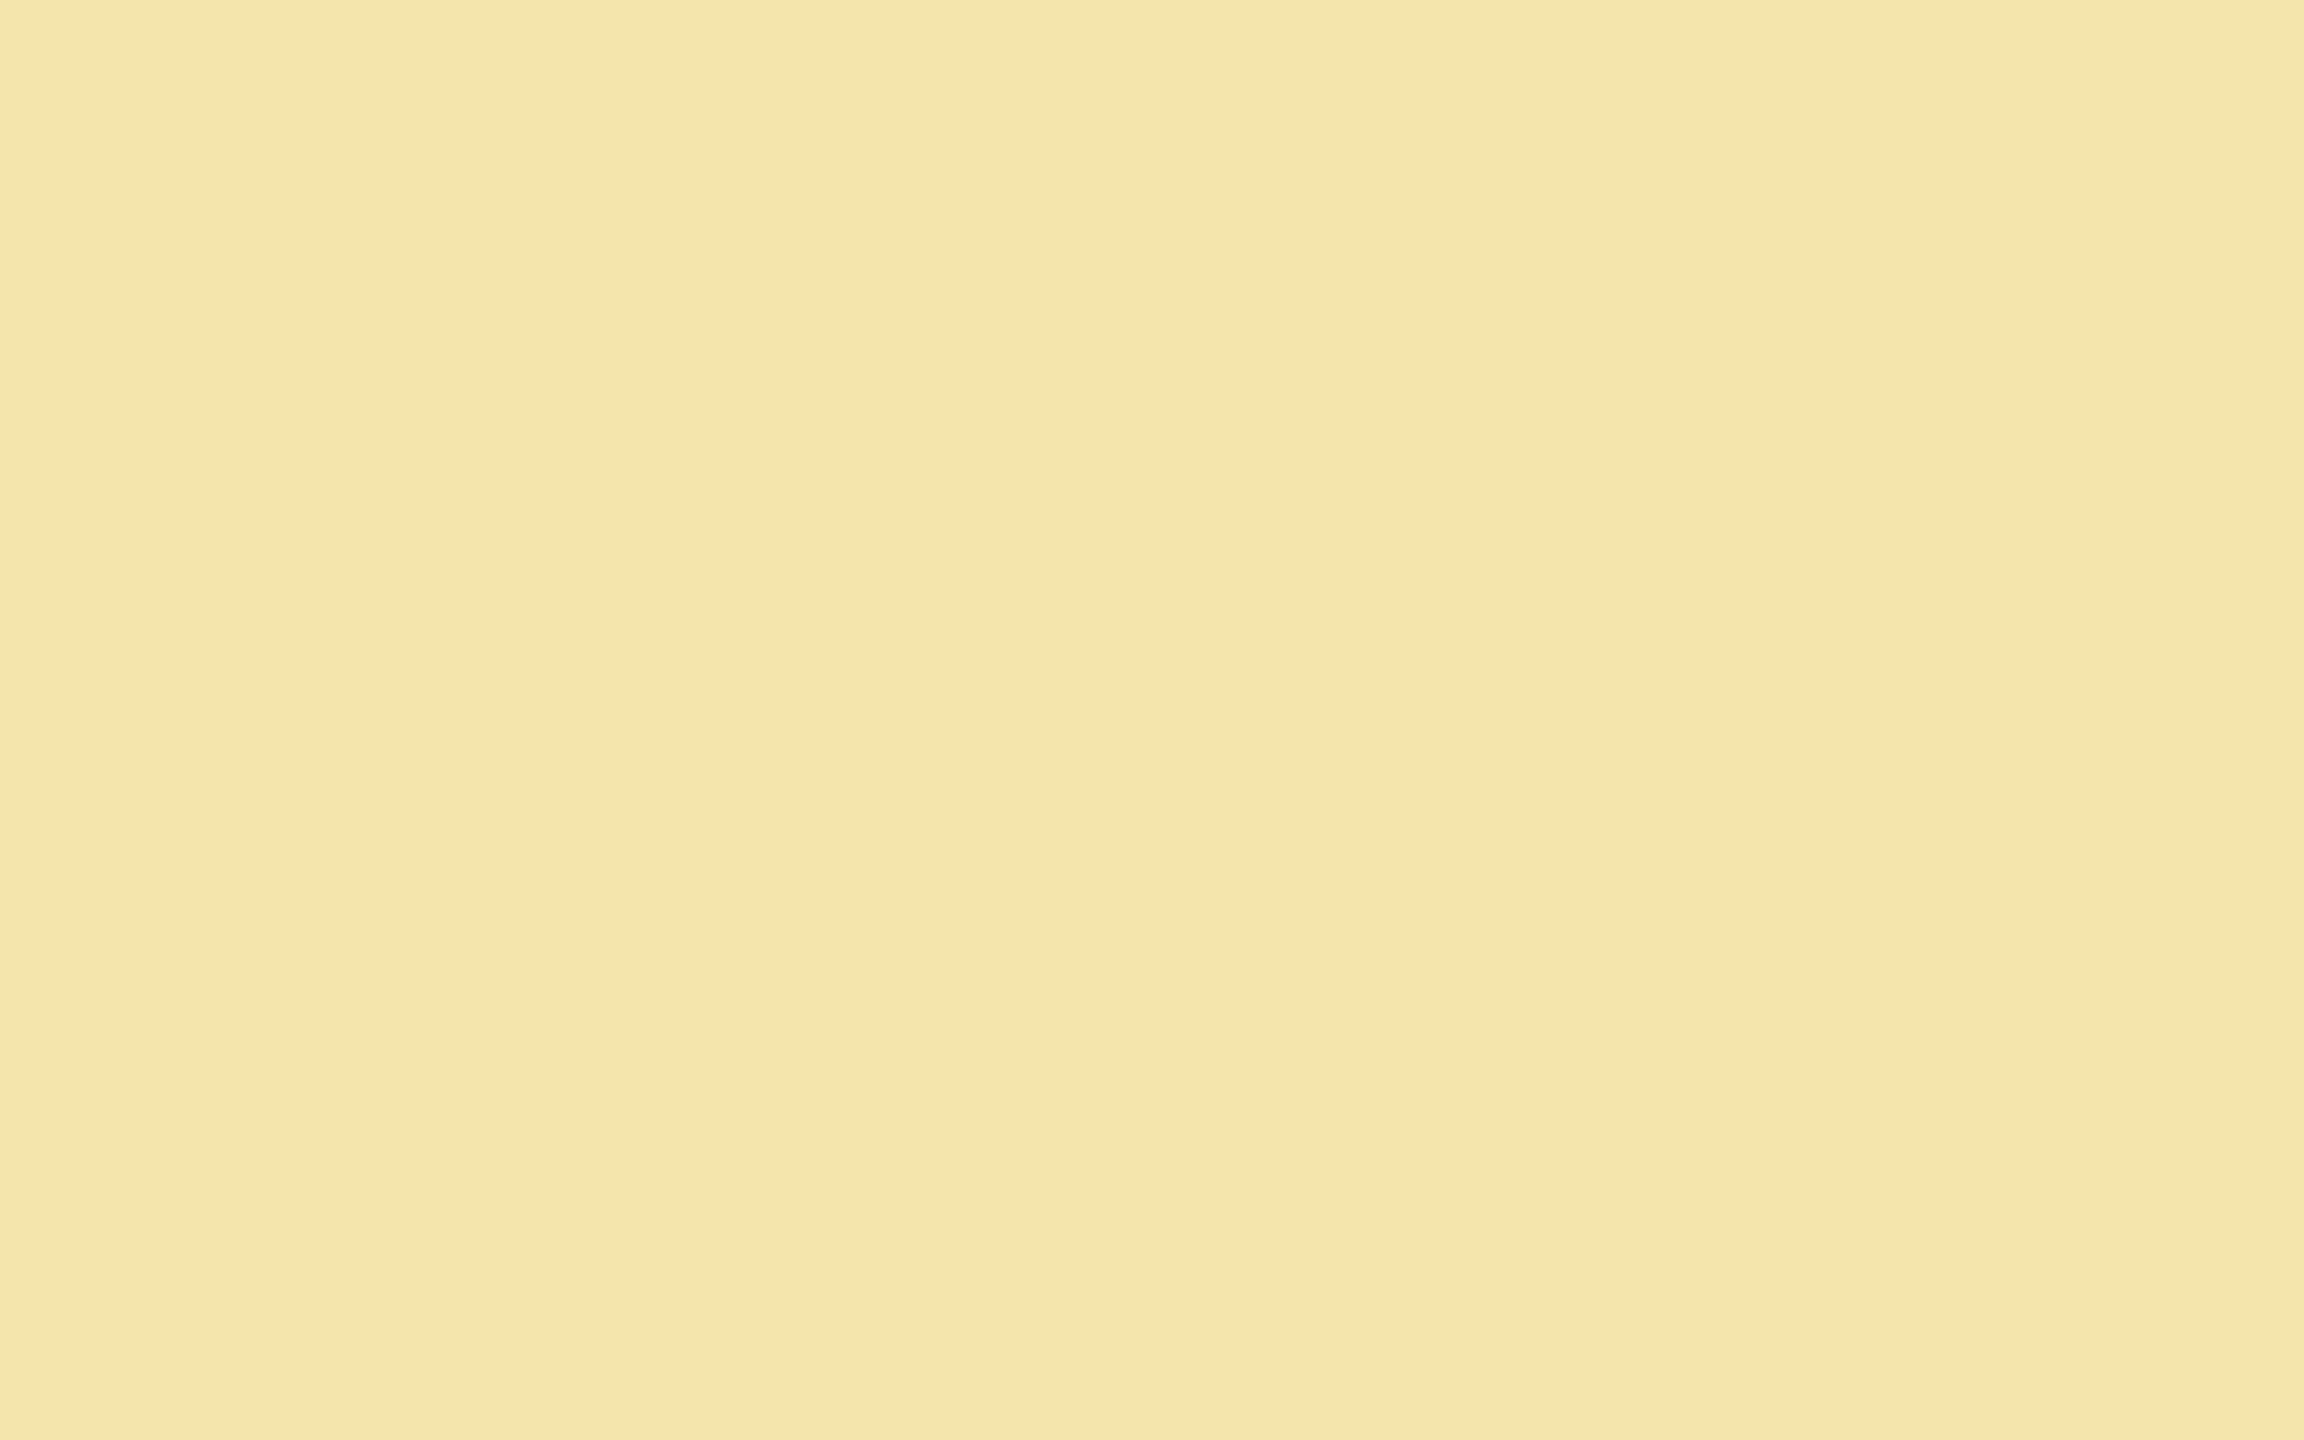 2304x1440 Vanilla Solid Color Background